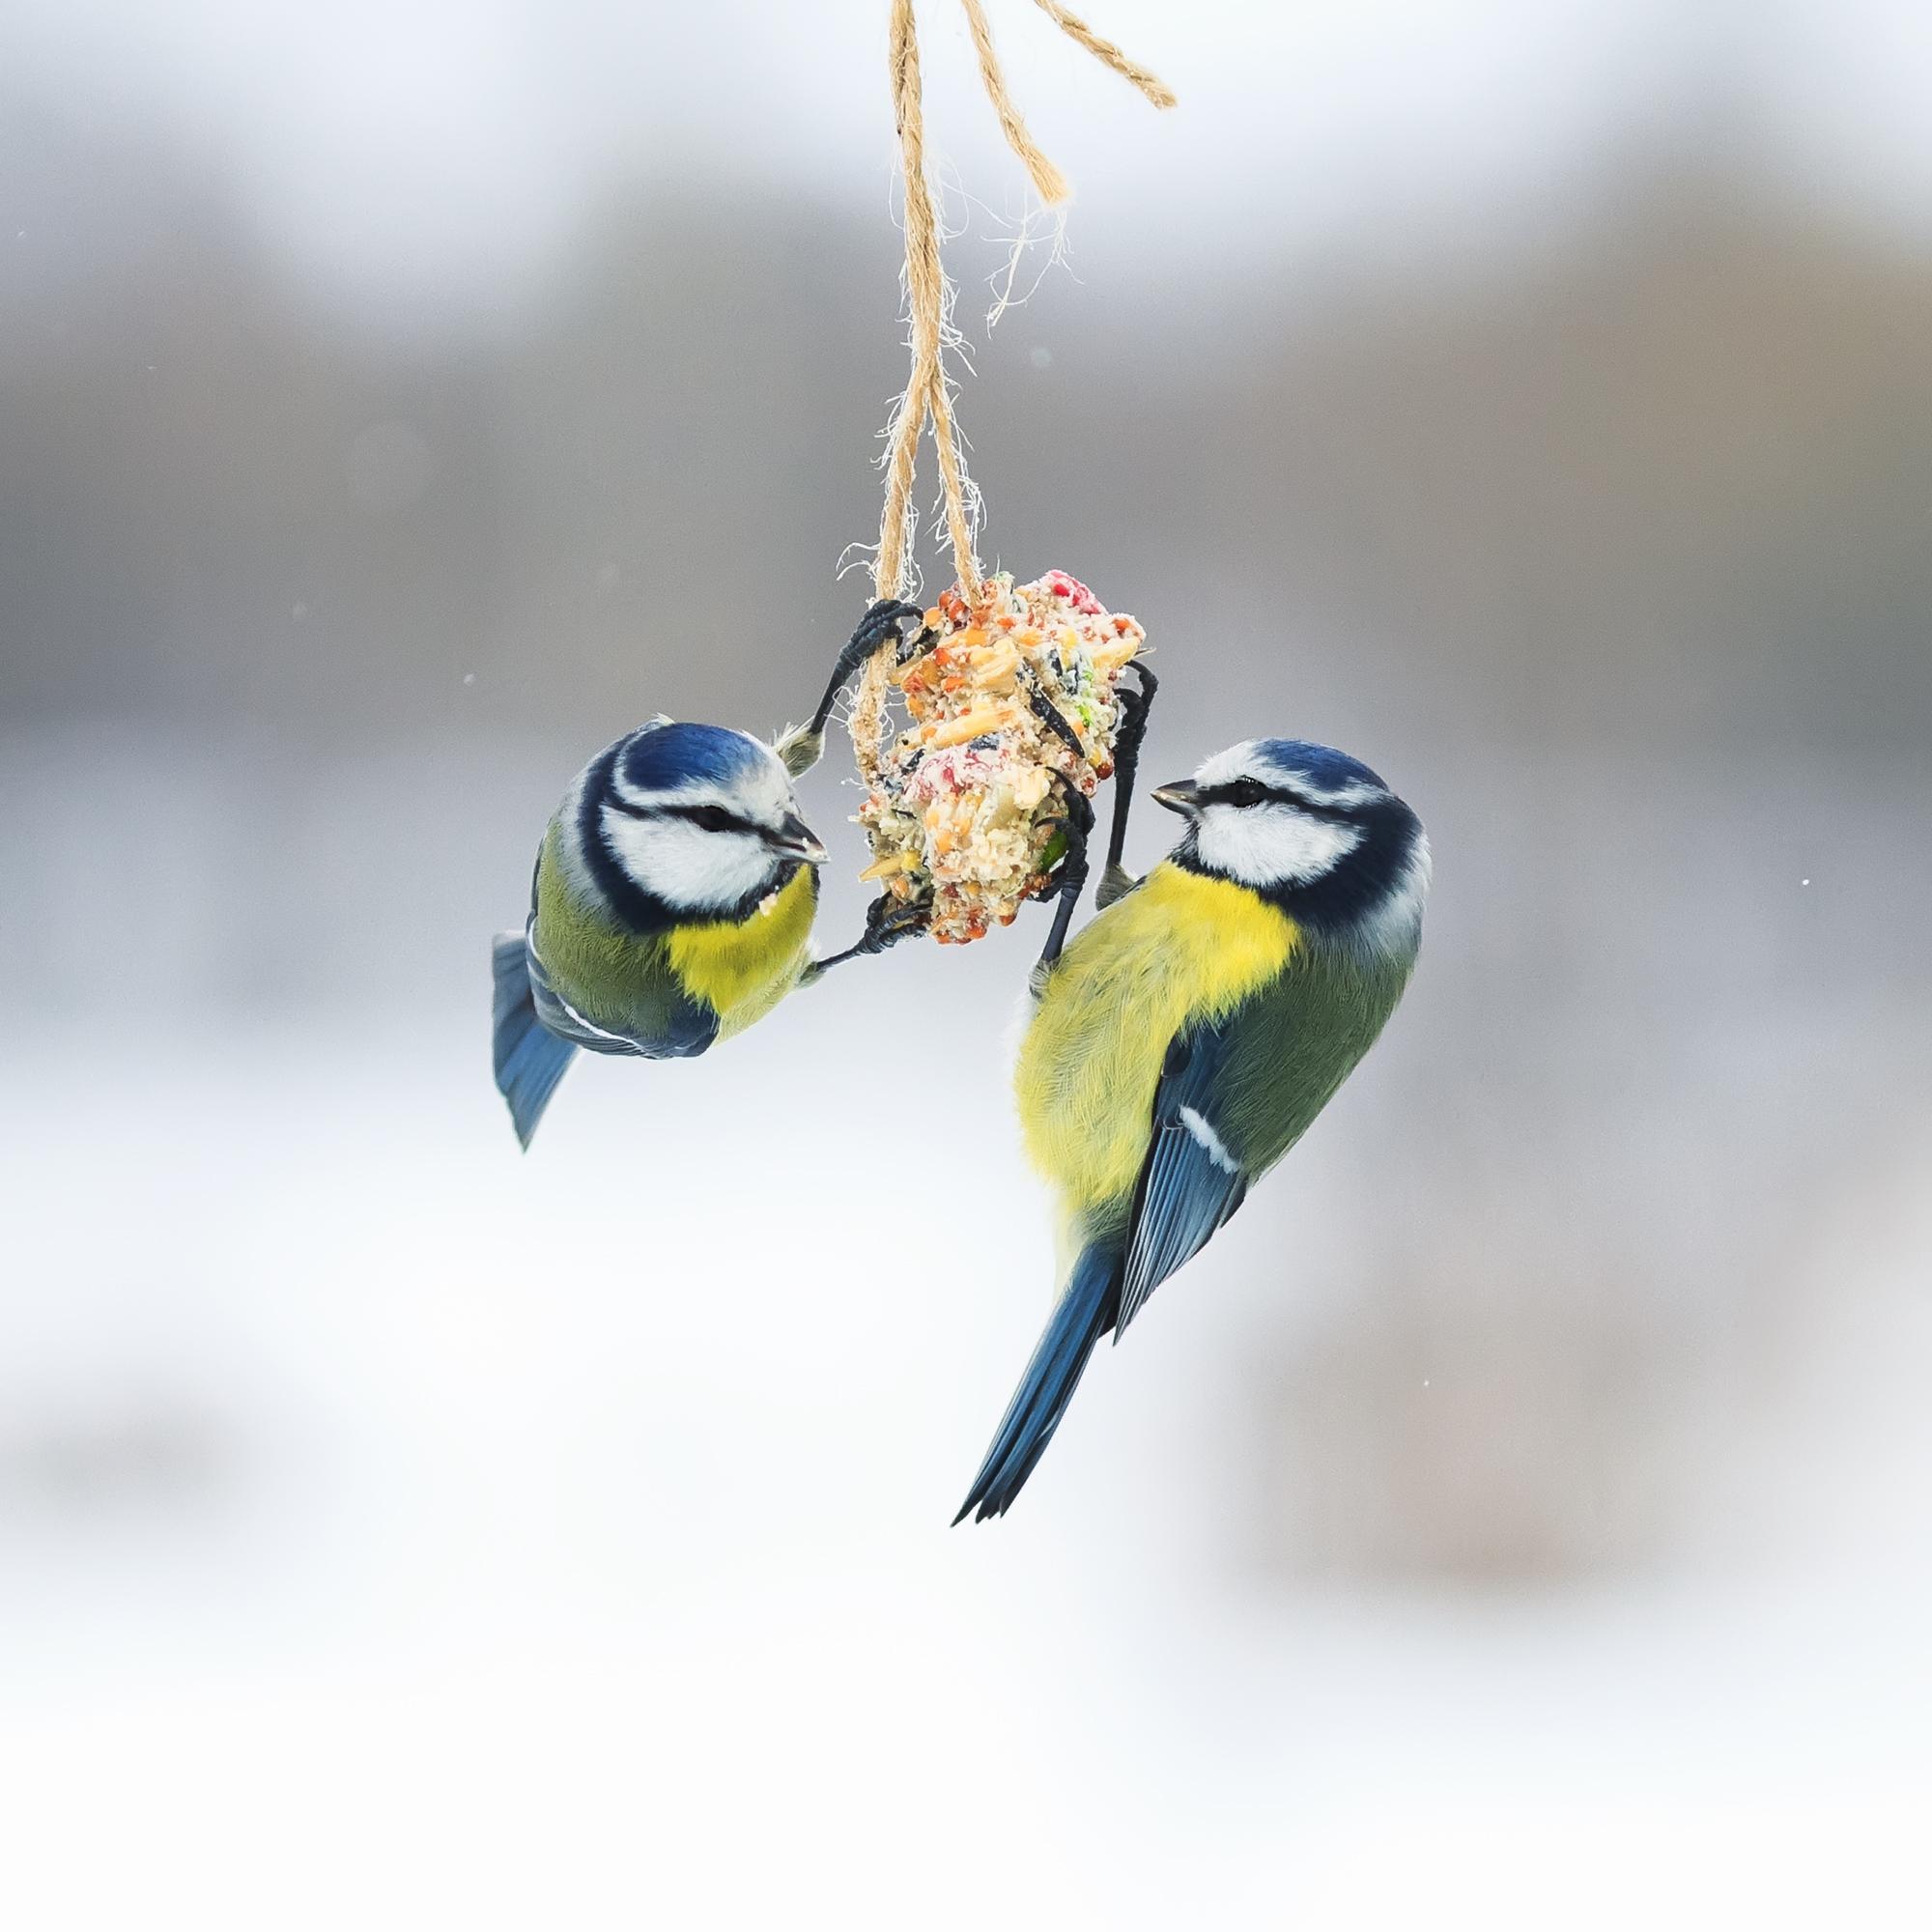 wreath | bird feeder | bird feeder wreath | diy bird feeder | diy bird feeder wreath | feed | bird | diy | yard